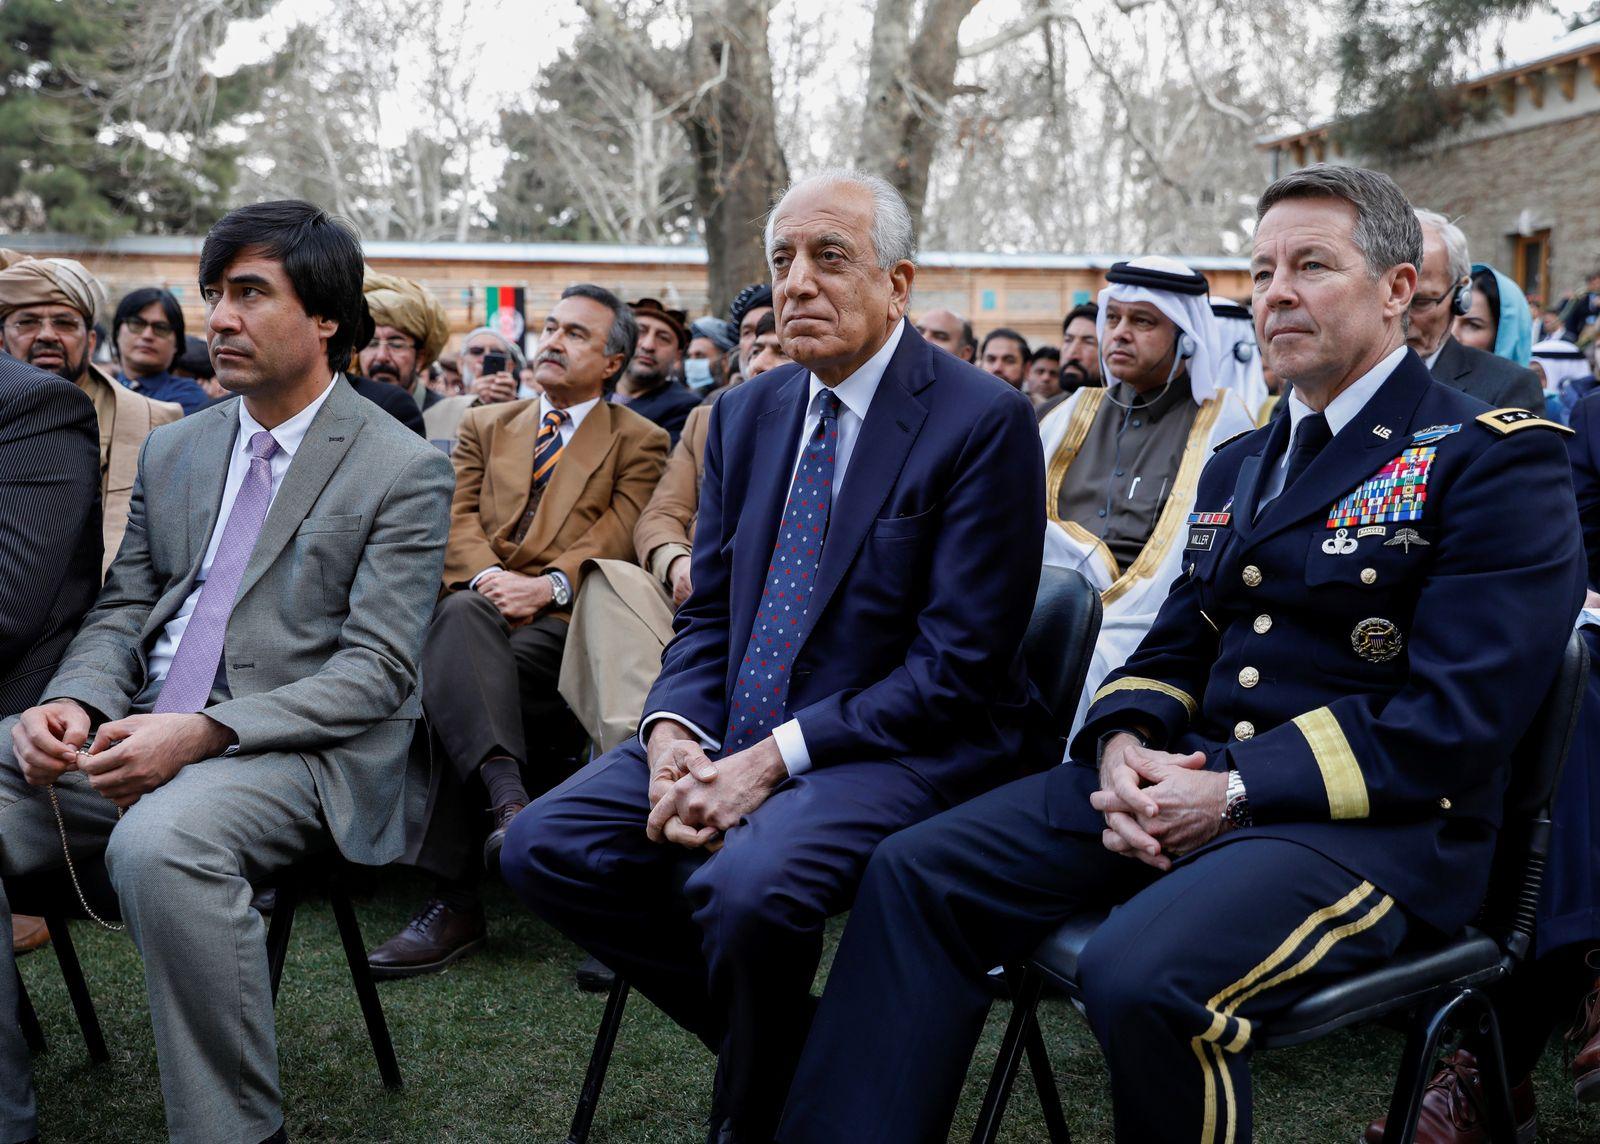 U.S. envoy for peace in Afghanistan Zalmay Khalilzad and U.S. Army General Scott Miller attend Afghanistan's President Ashraf Ghani's inauguration as president, in Kabul